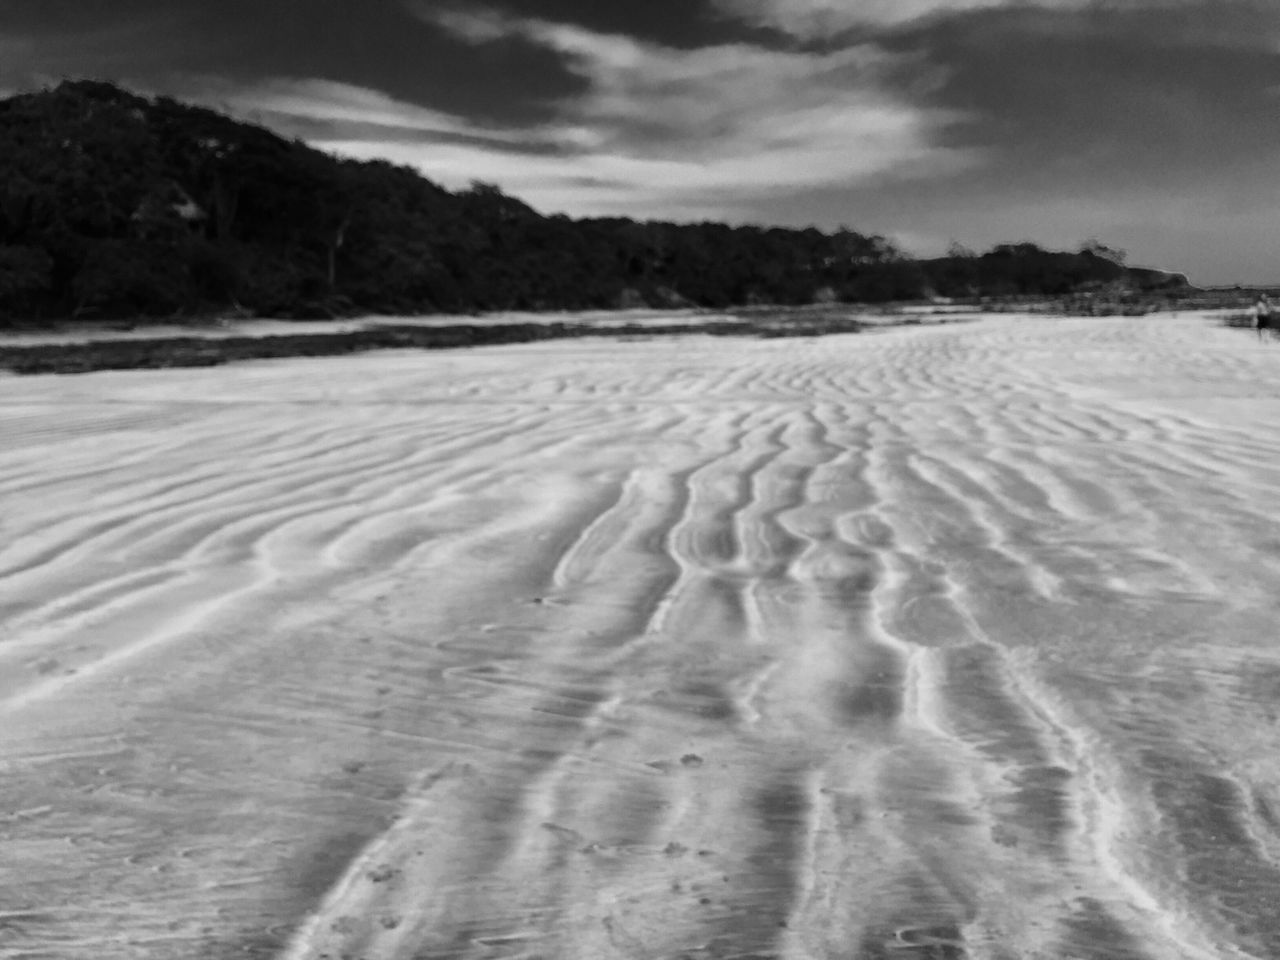 Beach Beachphotography Beach Photography Blackandwhite Black And White Nature Nature_collection Costa Rica